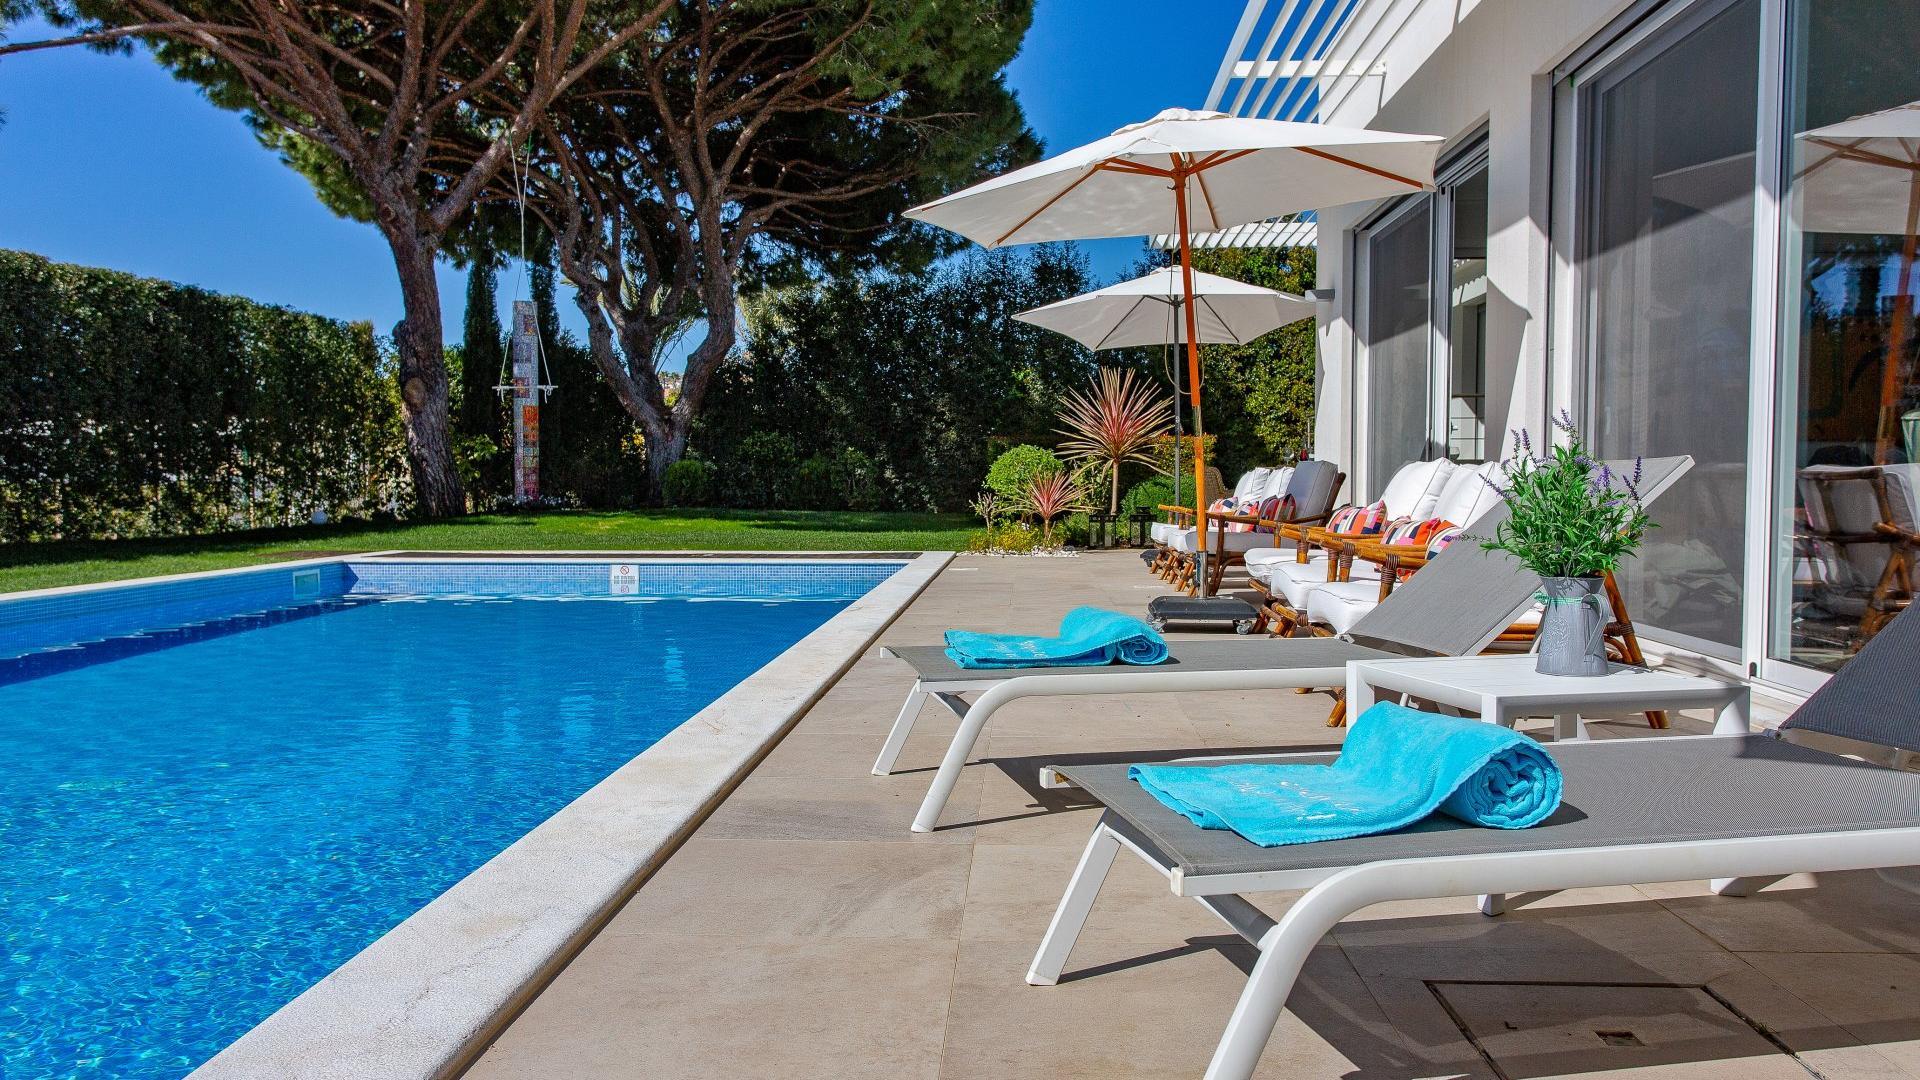 Villa das Artes - Dunas Douradas, Vale do Lobo, Algarve - _P1_6814.jpg